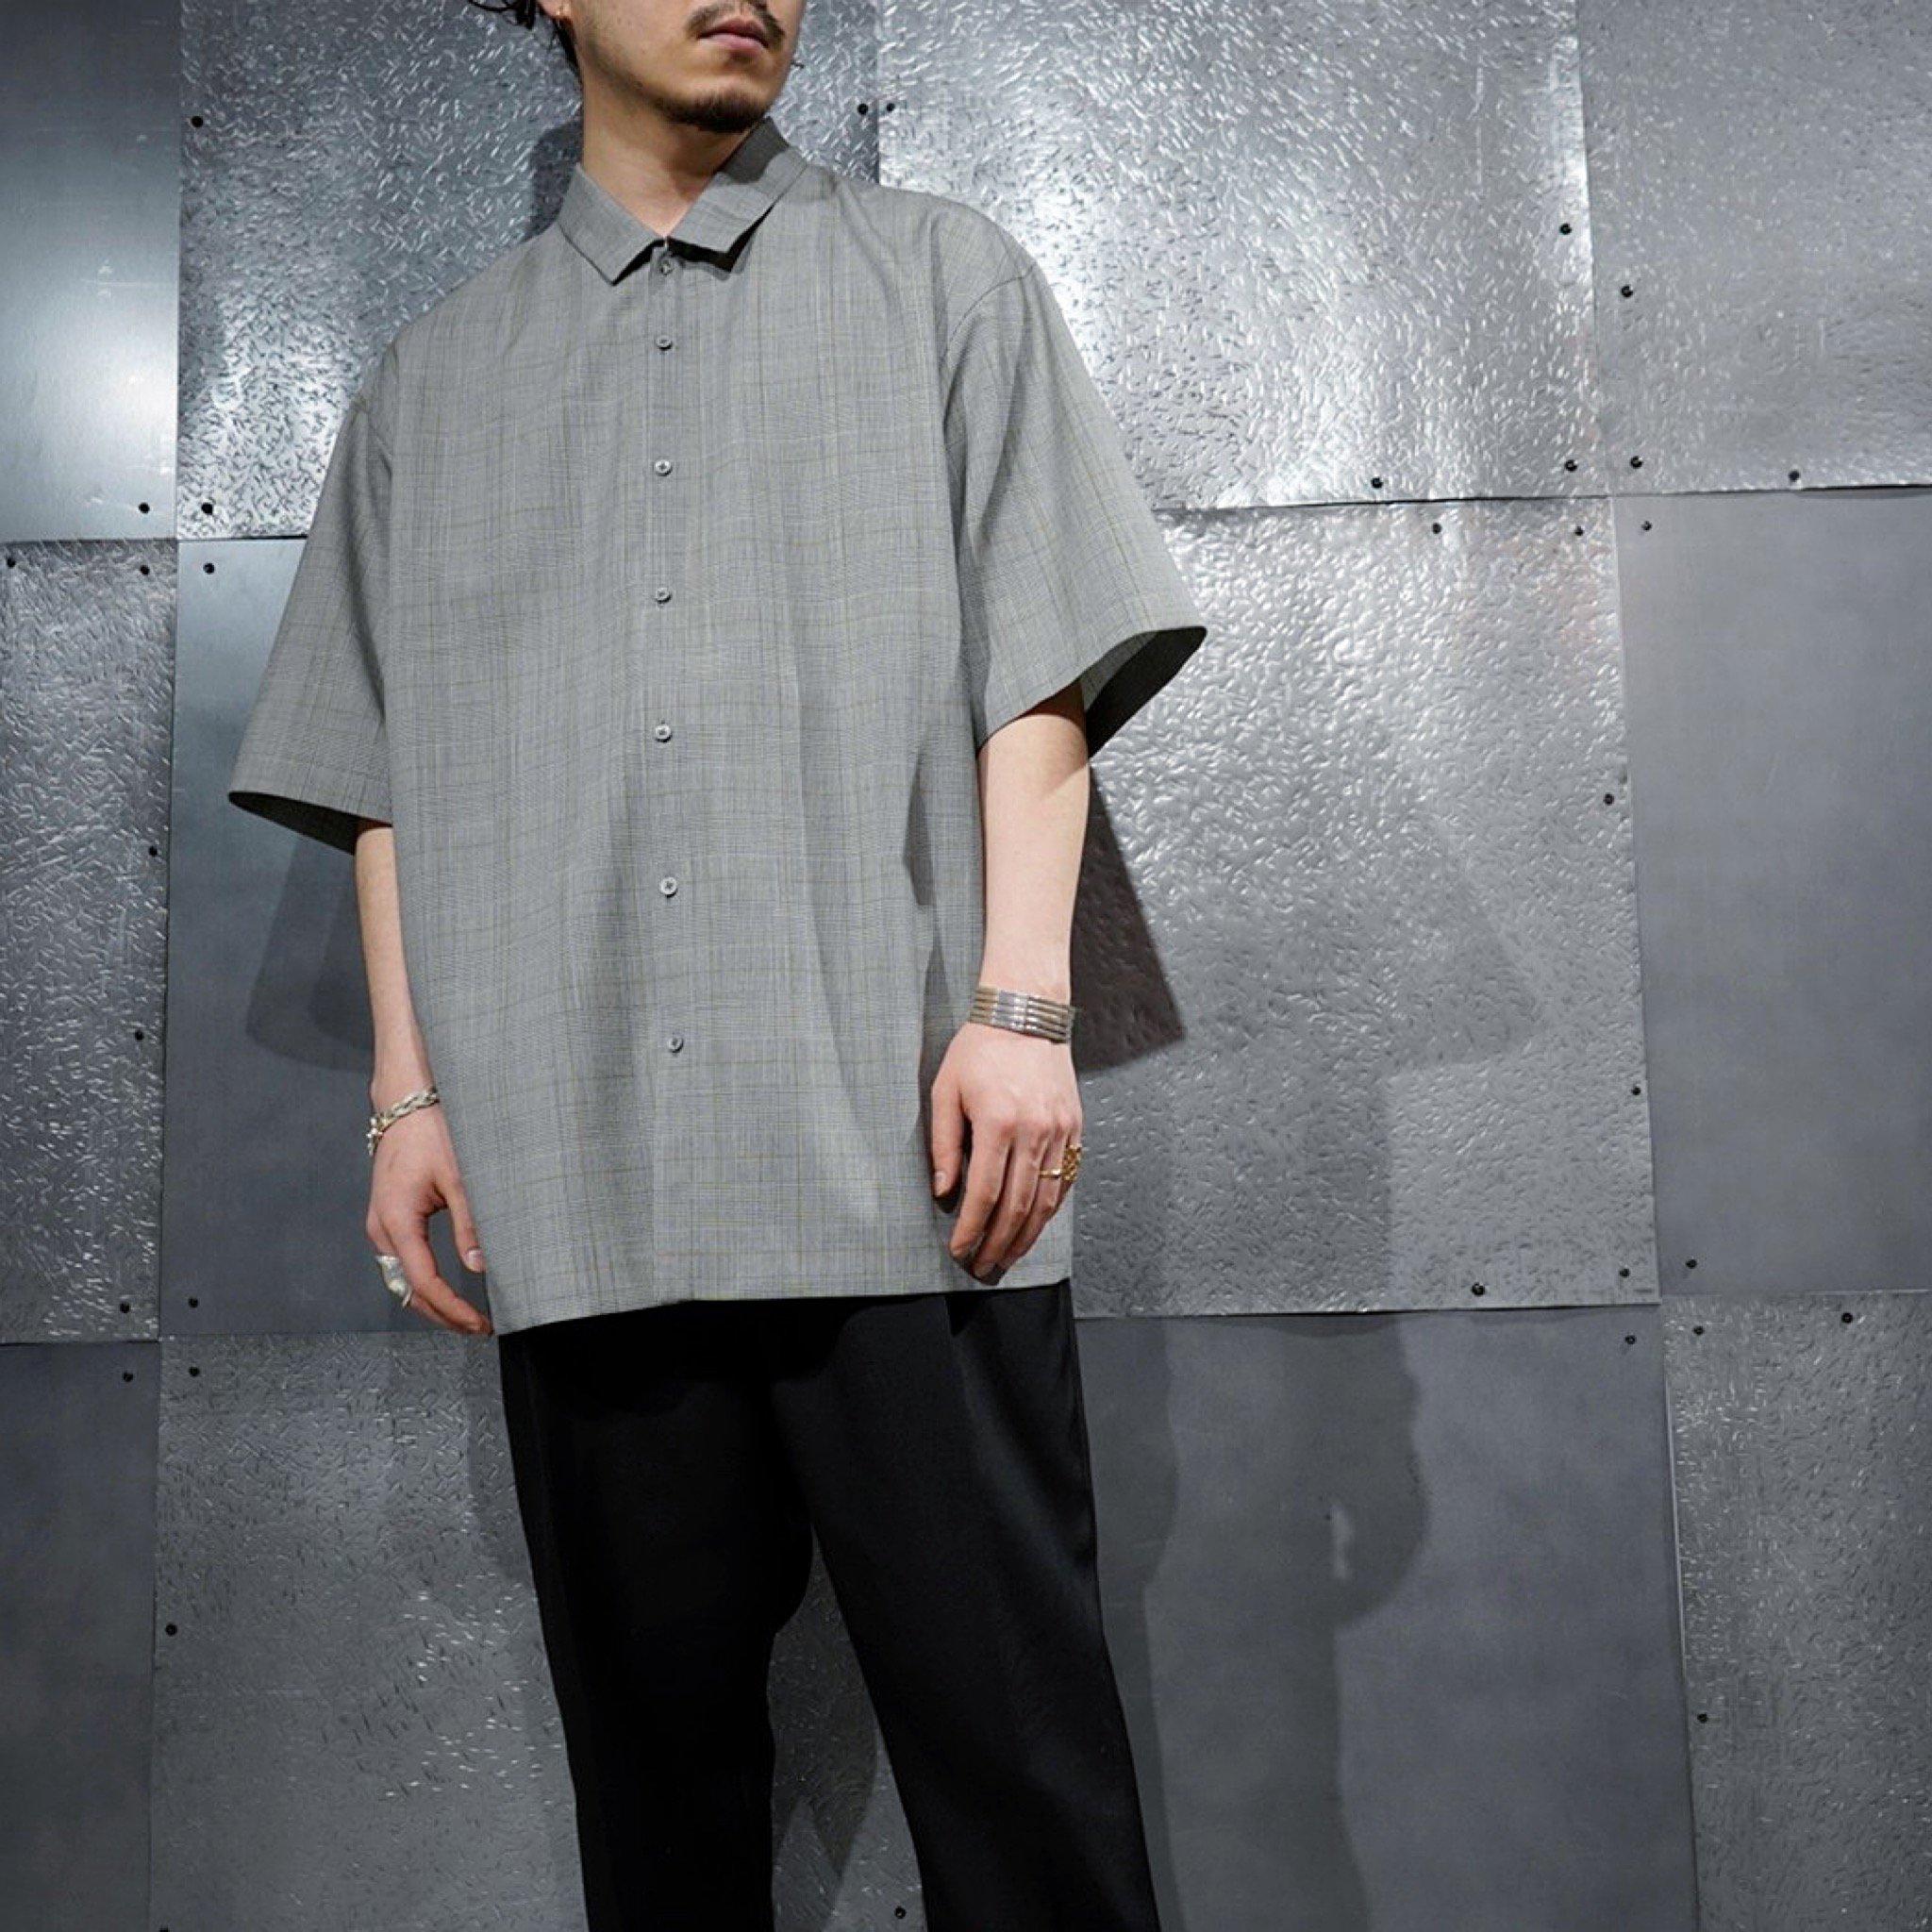 【ATON】<br>トロピカルウールオーバーサイズシャツ